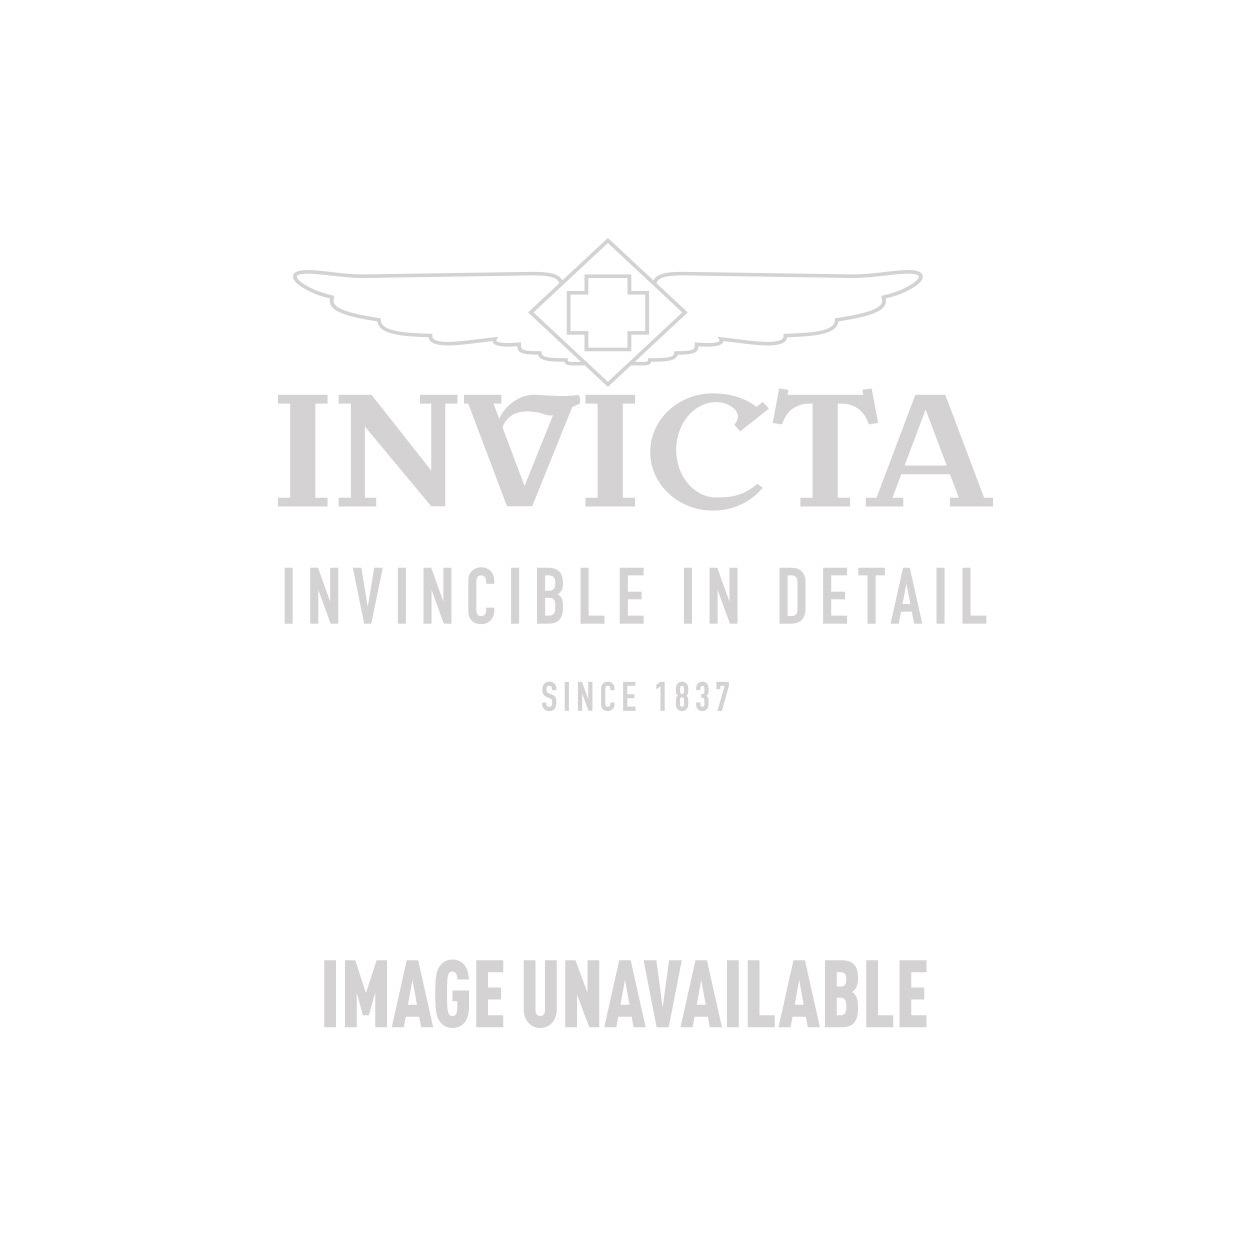 Invicta Venom Swiss Made Quartz Watch - Gold case with Gold, Grey tone Stainless Steel, Polyurethane band - Model 90135